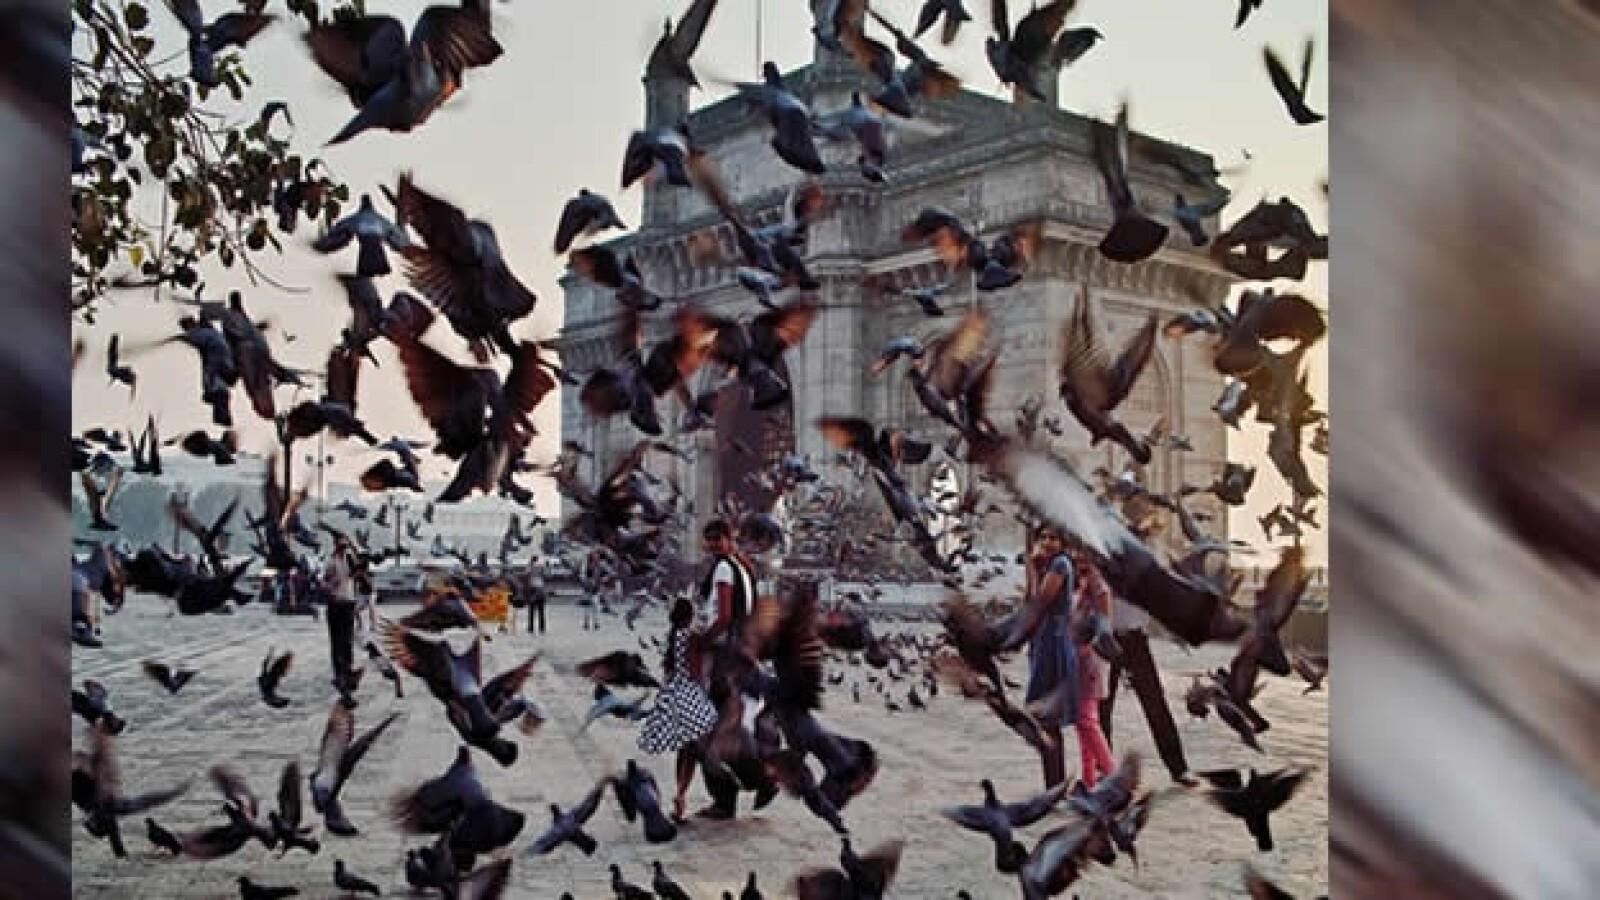 india Julie Mayfeng fotógrafa de viajes monocle, fotografia, viaje, foto